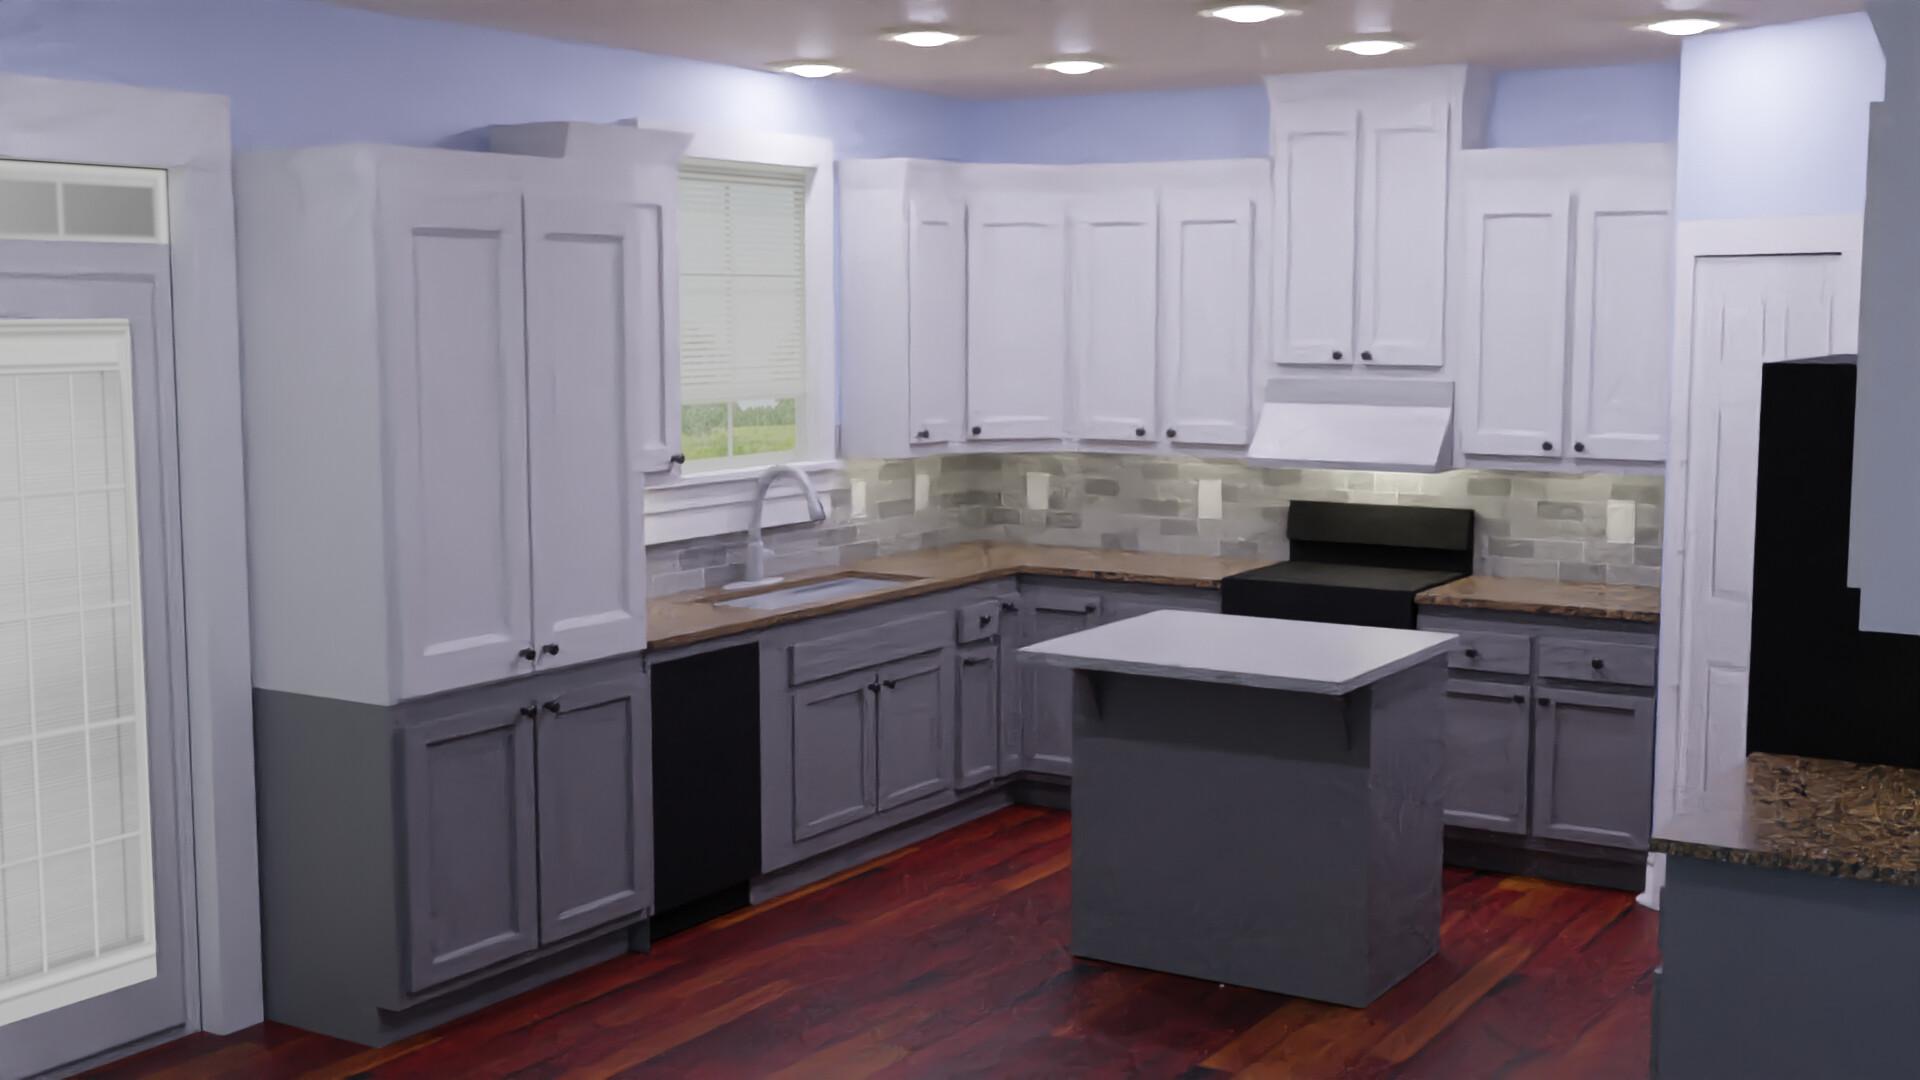 Artstation Kitchen Remodel Visualization Jack Crawford